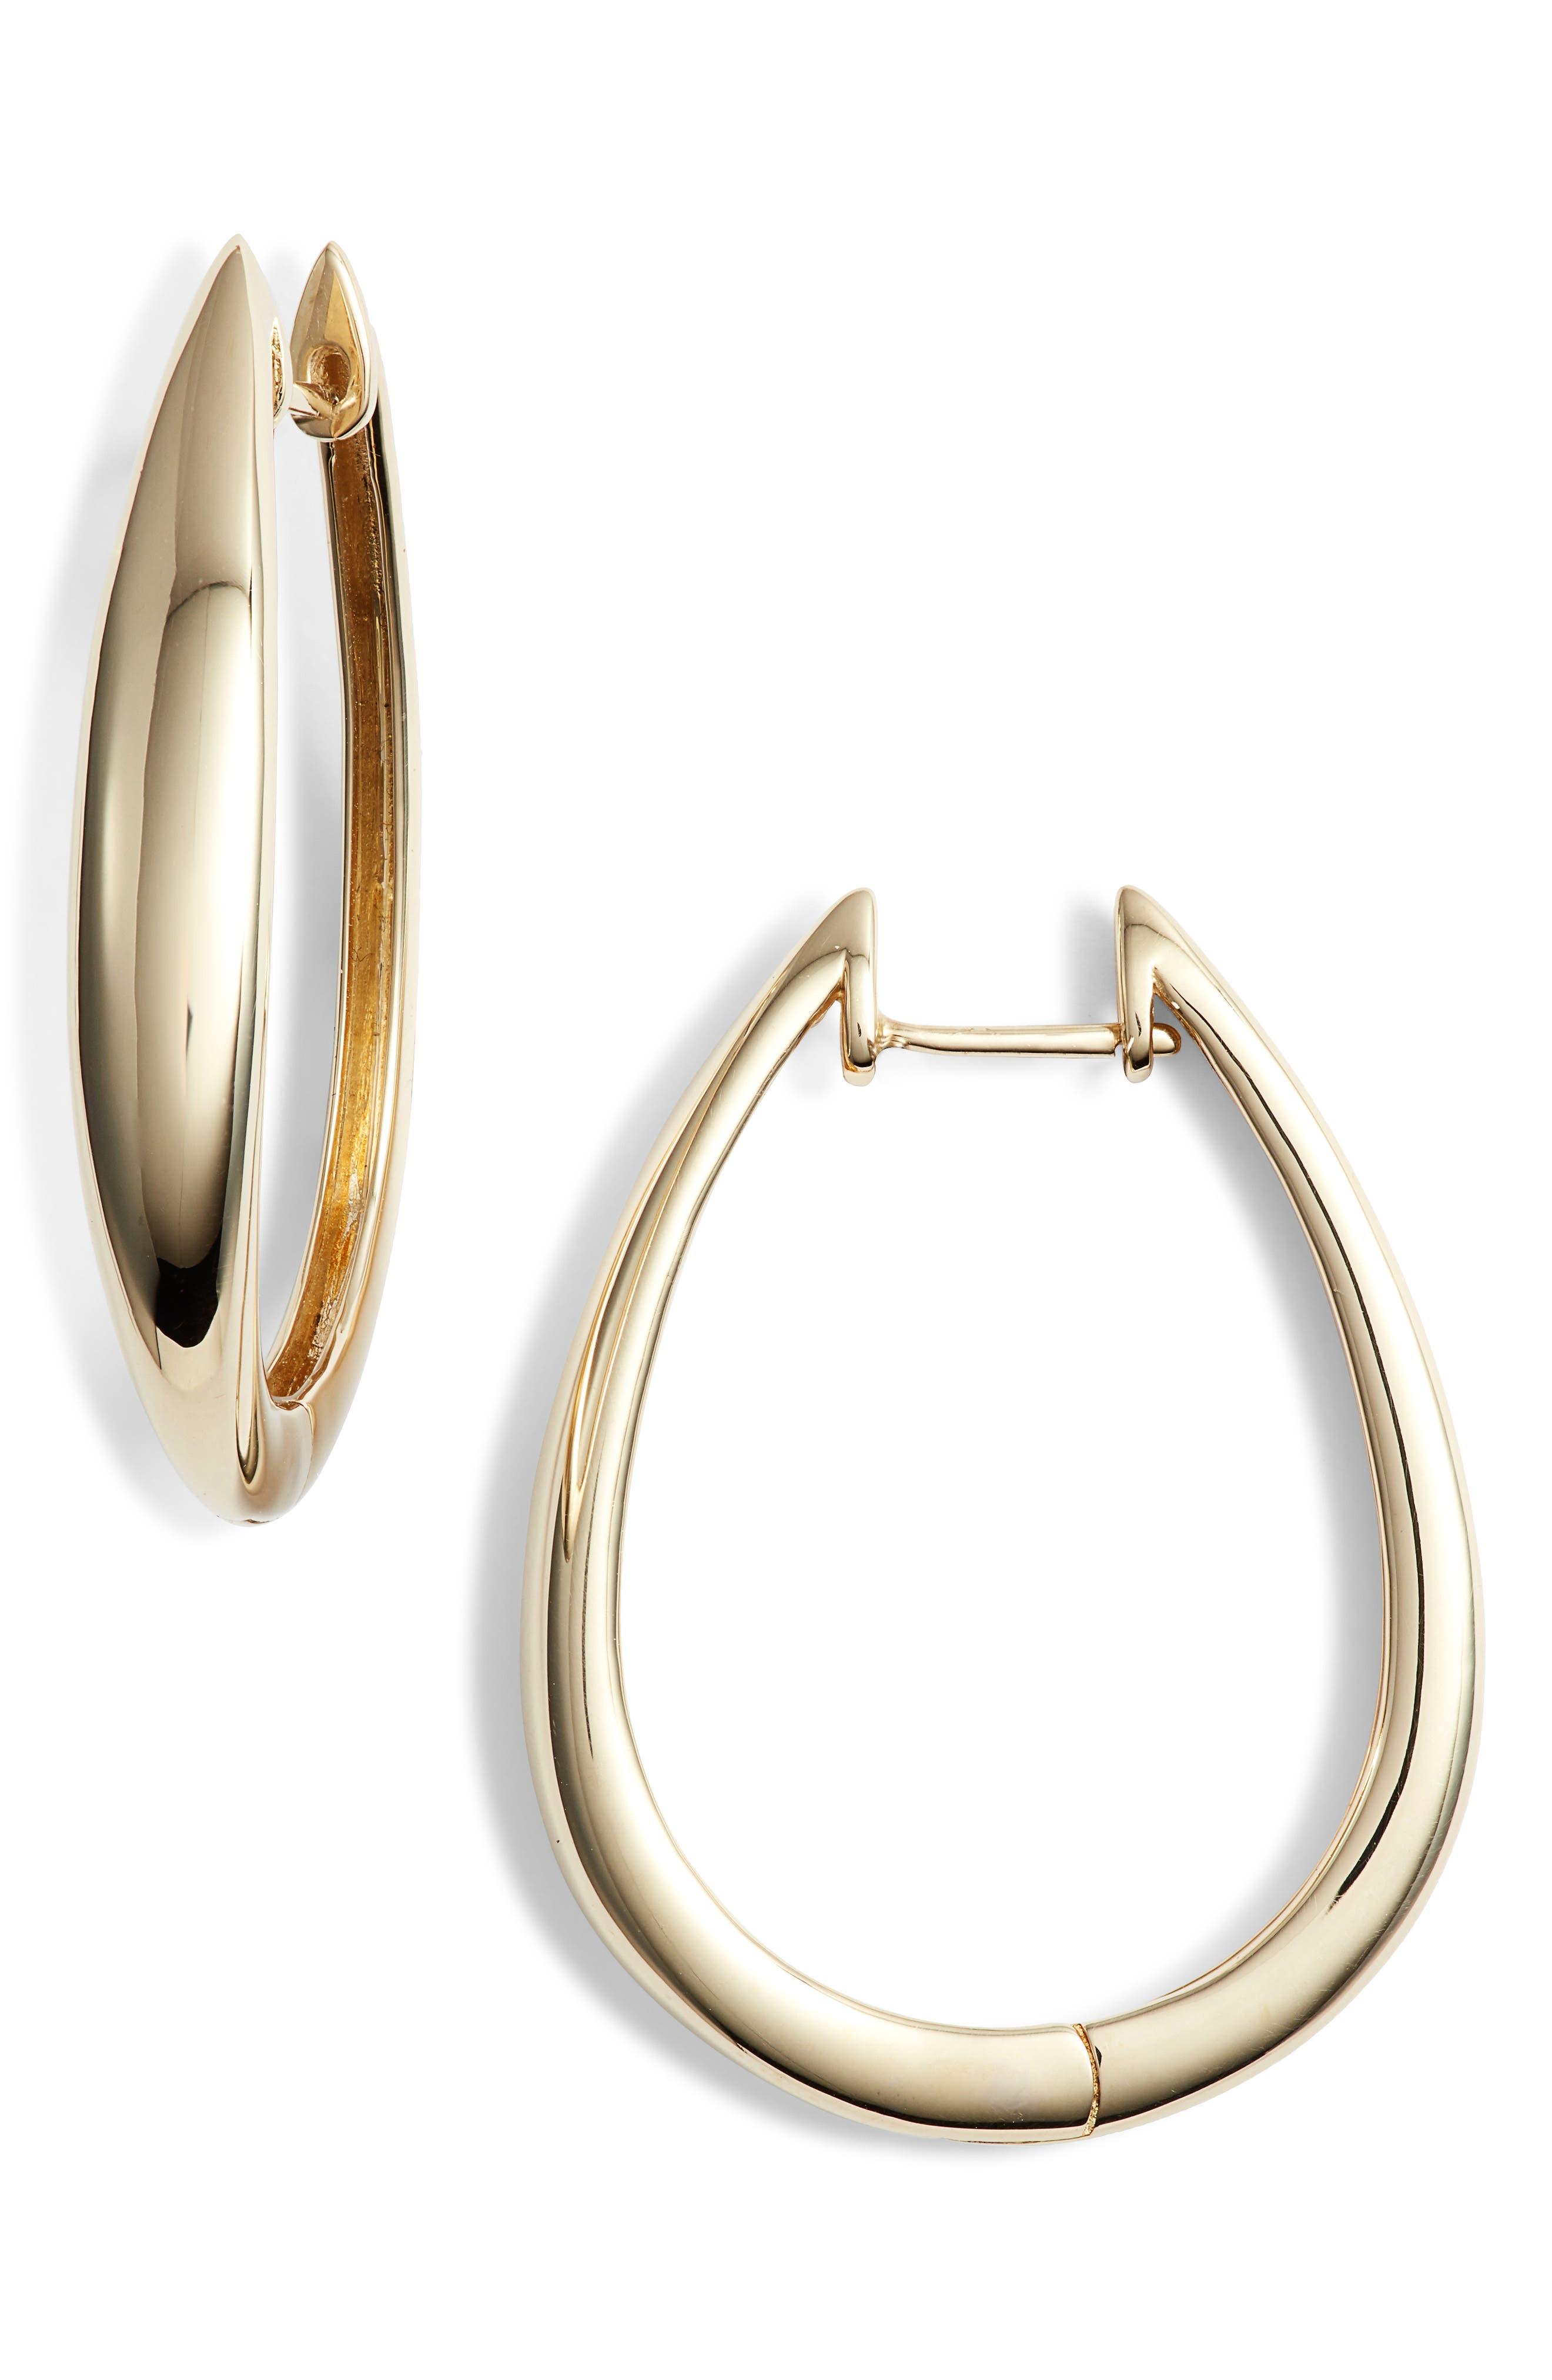 14K Gold Hoop Earrings,                             Main thumbnail 1, color,                             YELLOW GOLD/ DIA